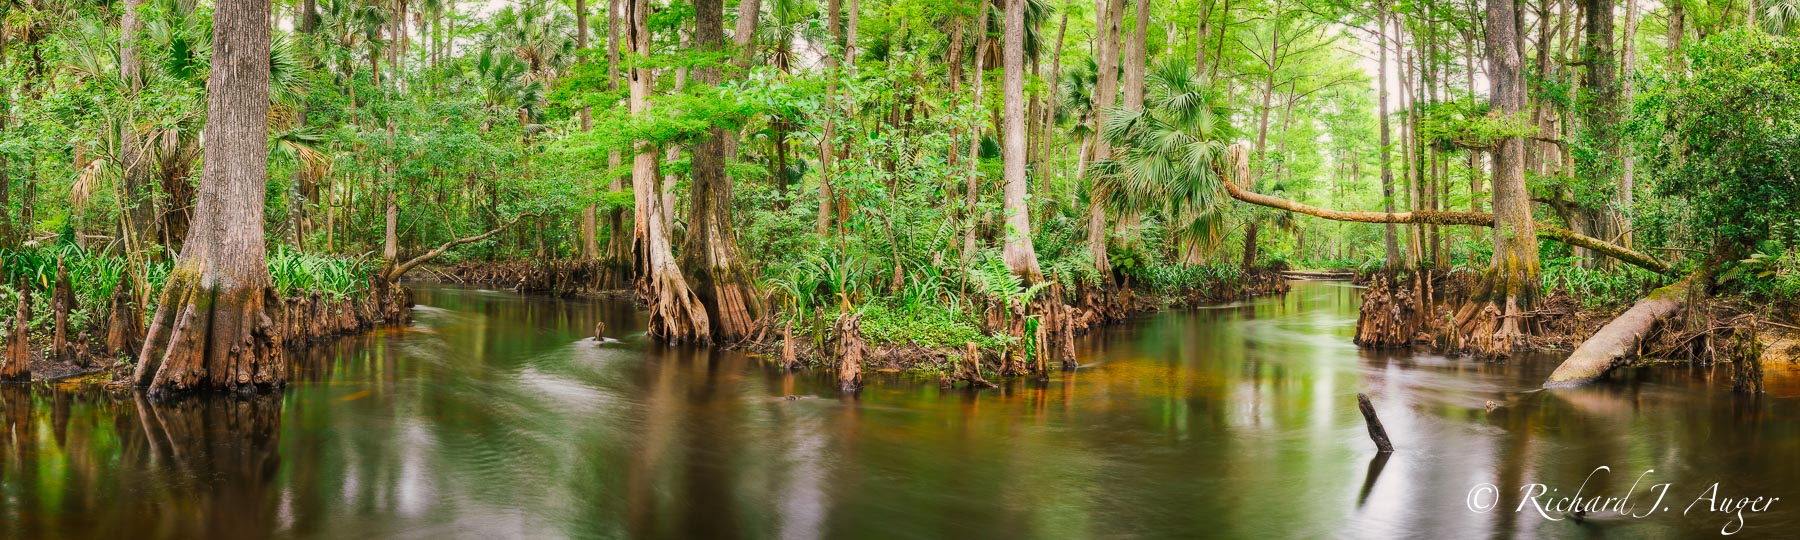 Loxahatchee River, Riverbend Park, jonathan dickinson state park, Florida, swamp, cypress, palm trees, blackwater, lanscape, photograph, photo, photographer, green, brown